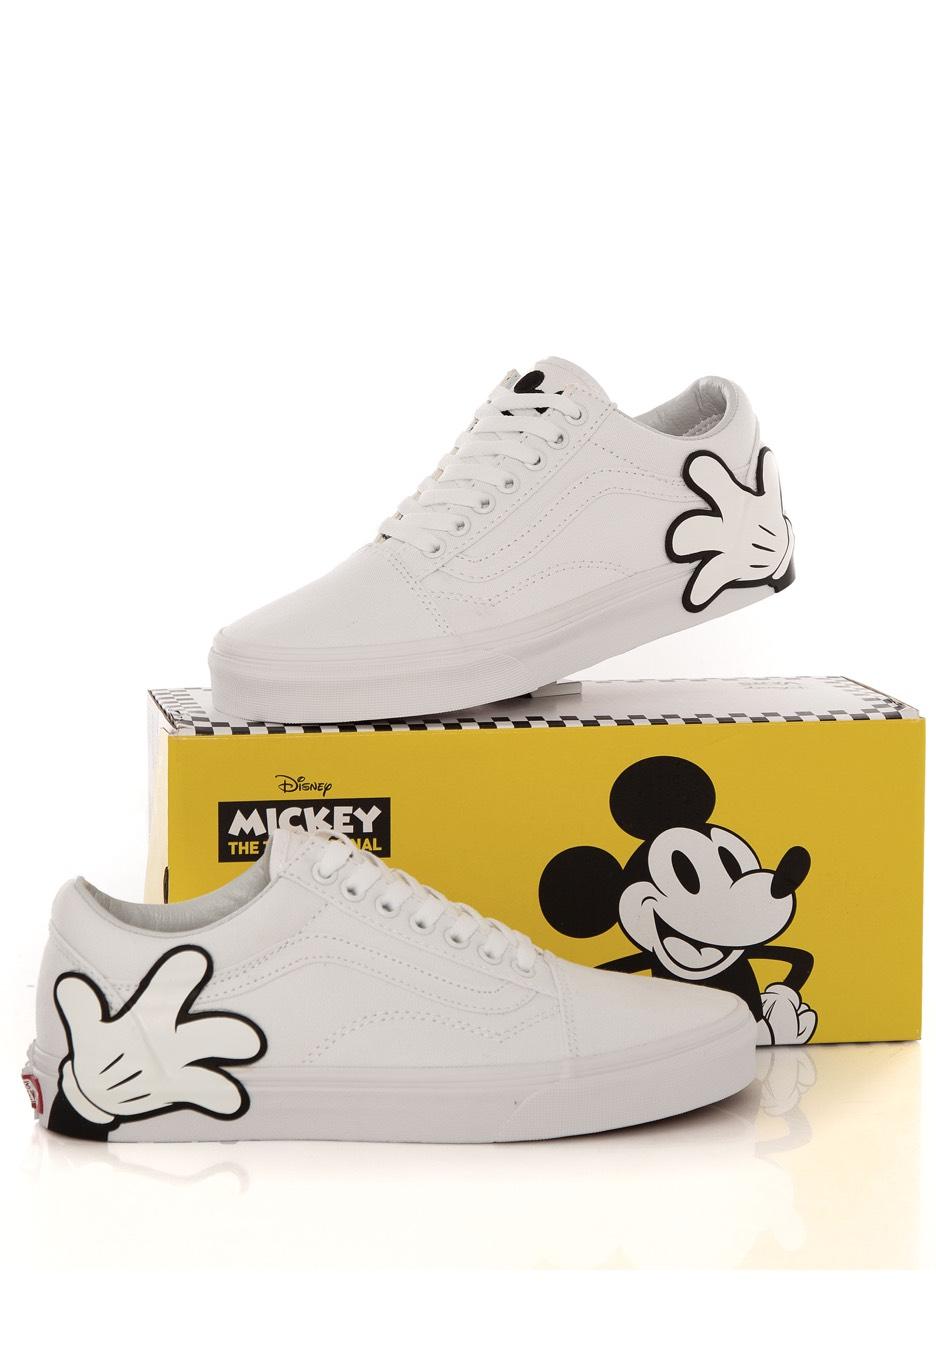 Old Skool Disney Mickey Mouse